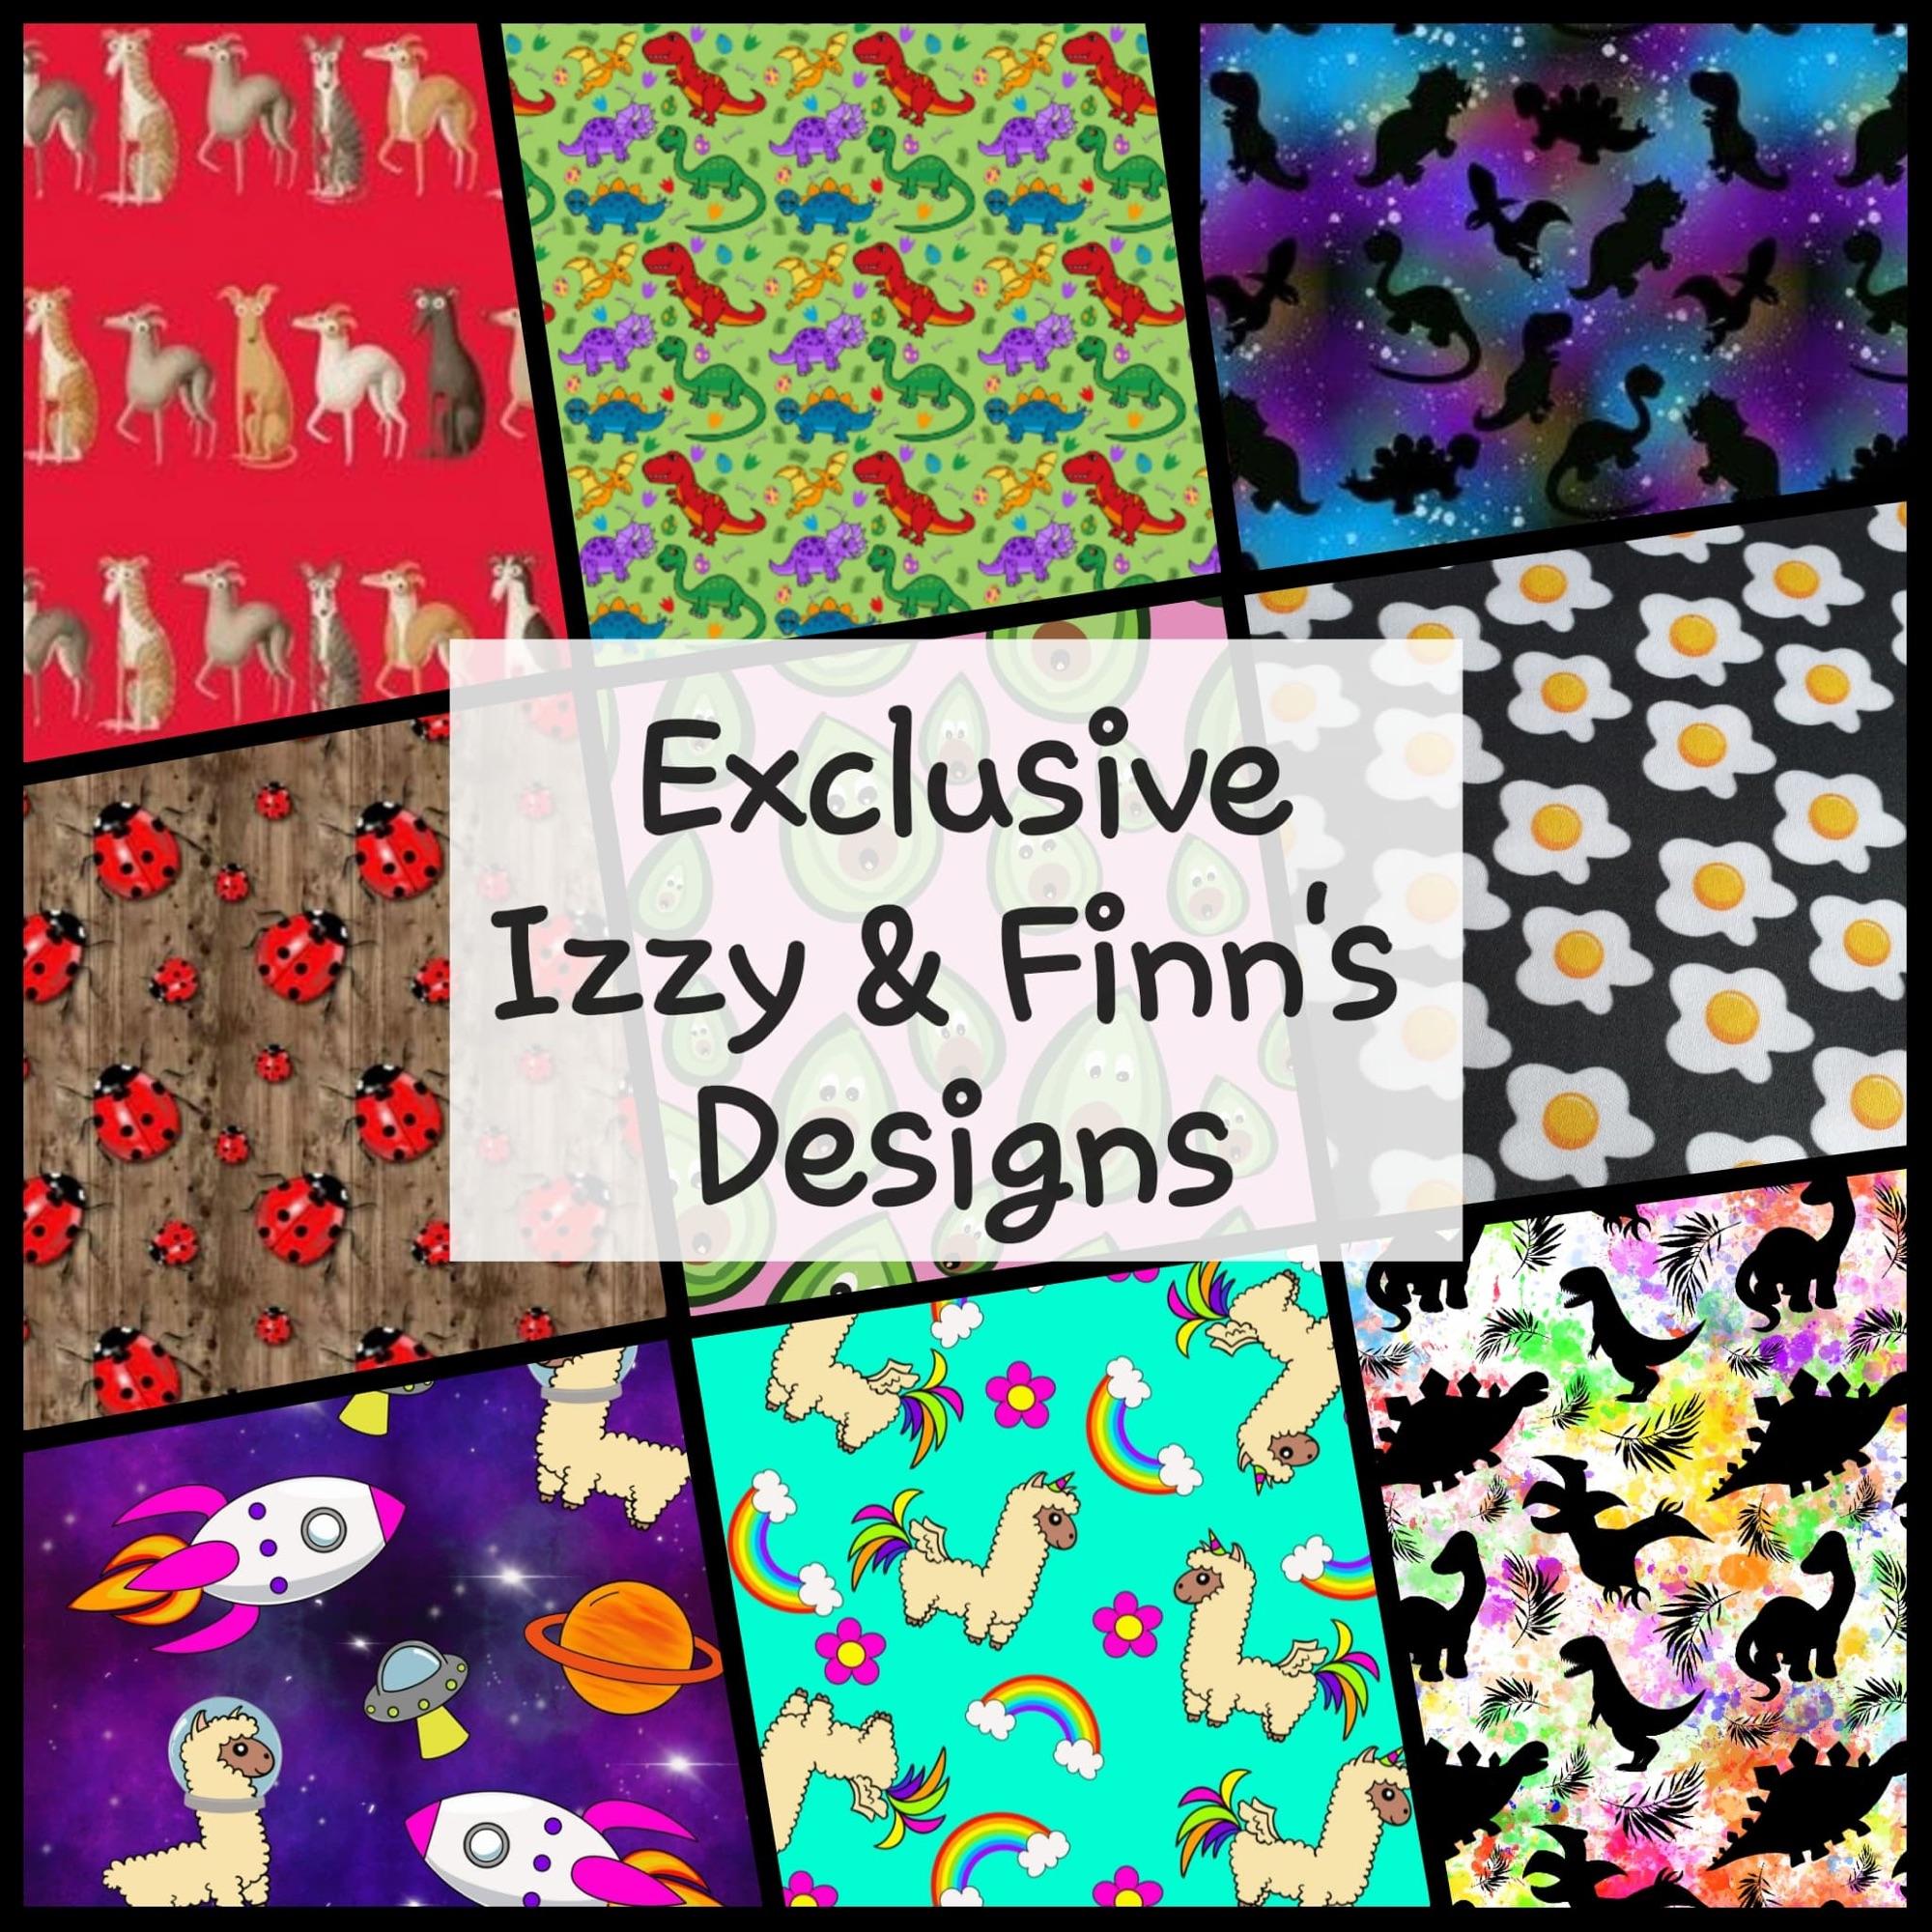 Exclsusive Izzy & Finn's Designs